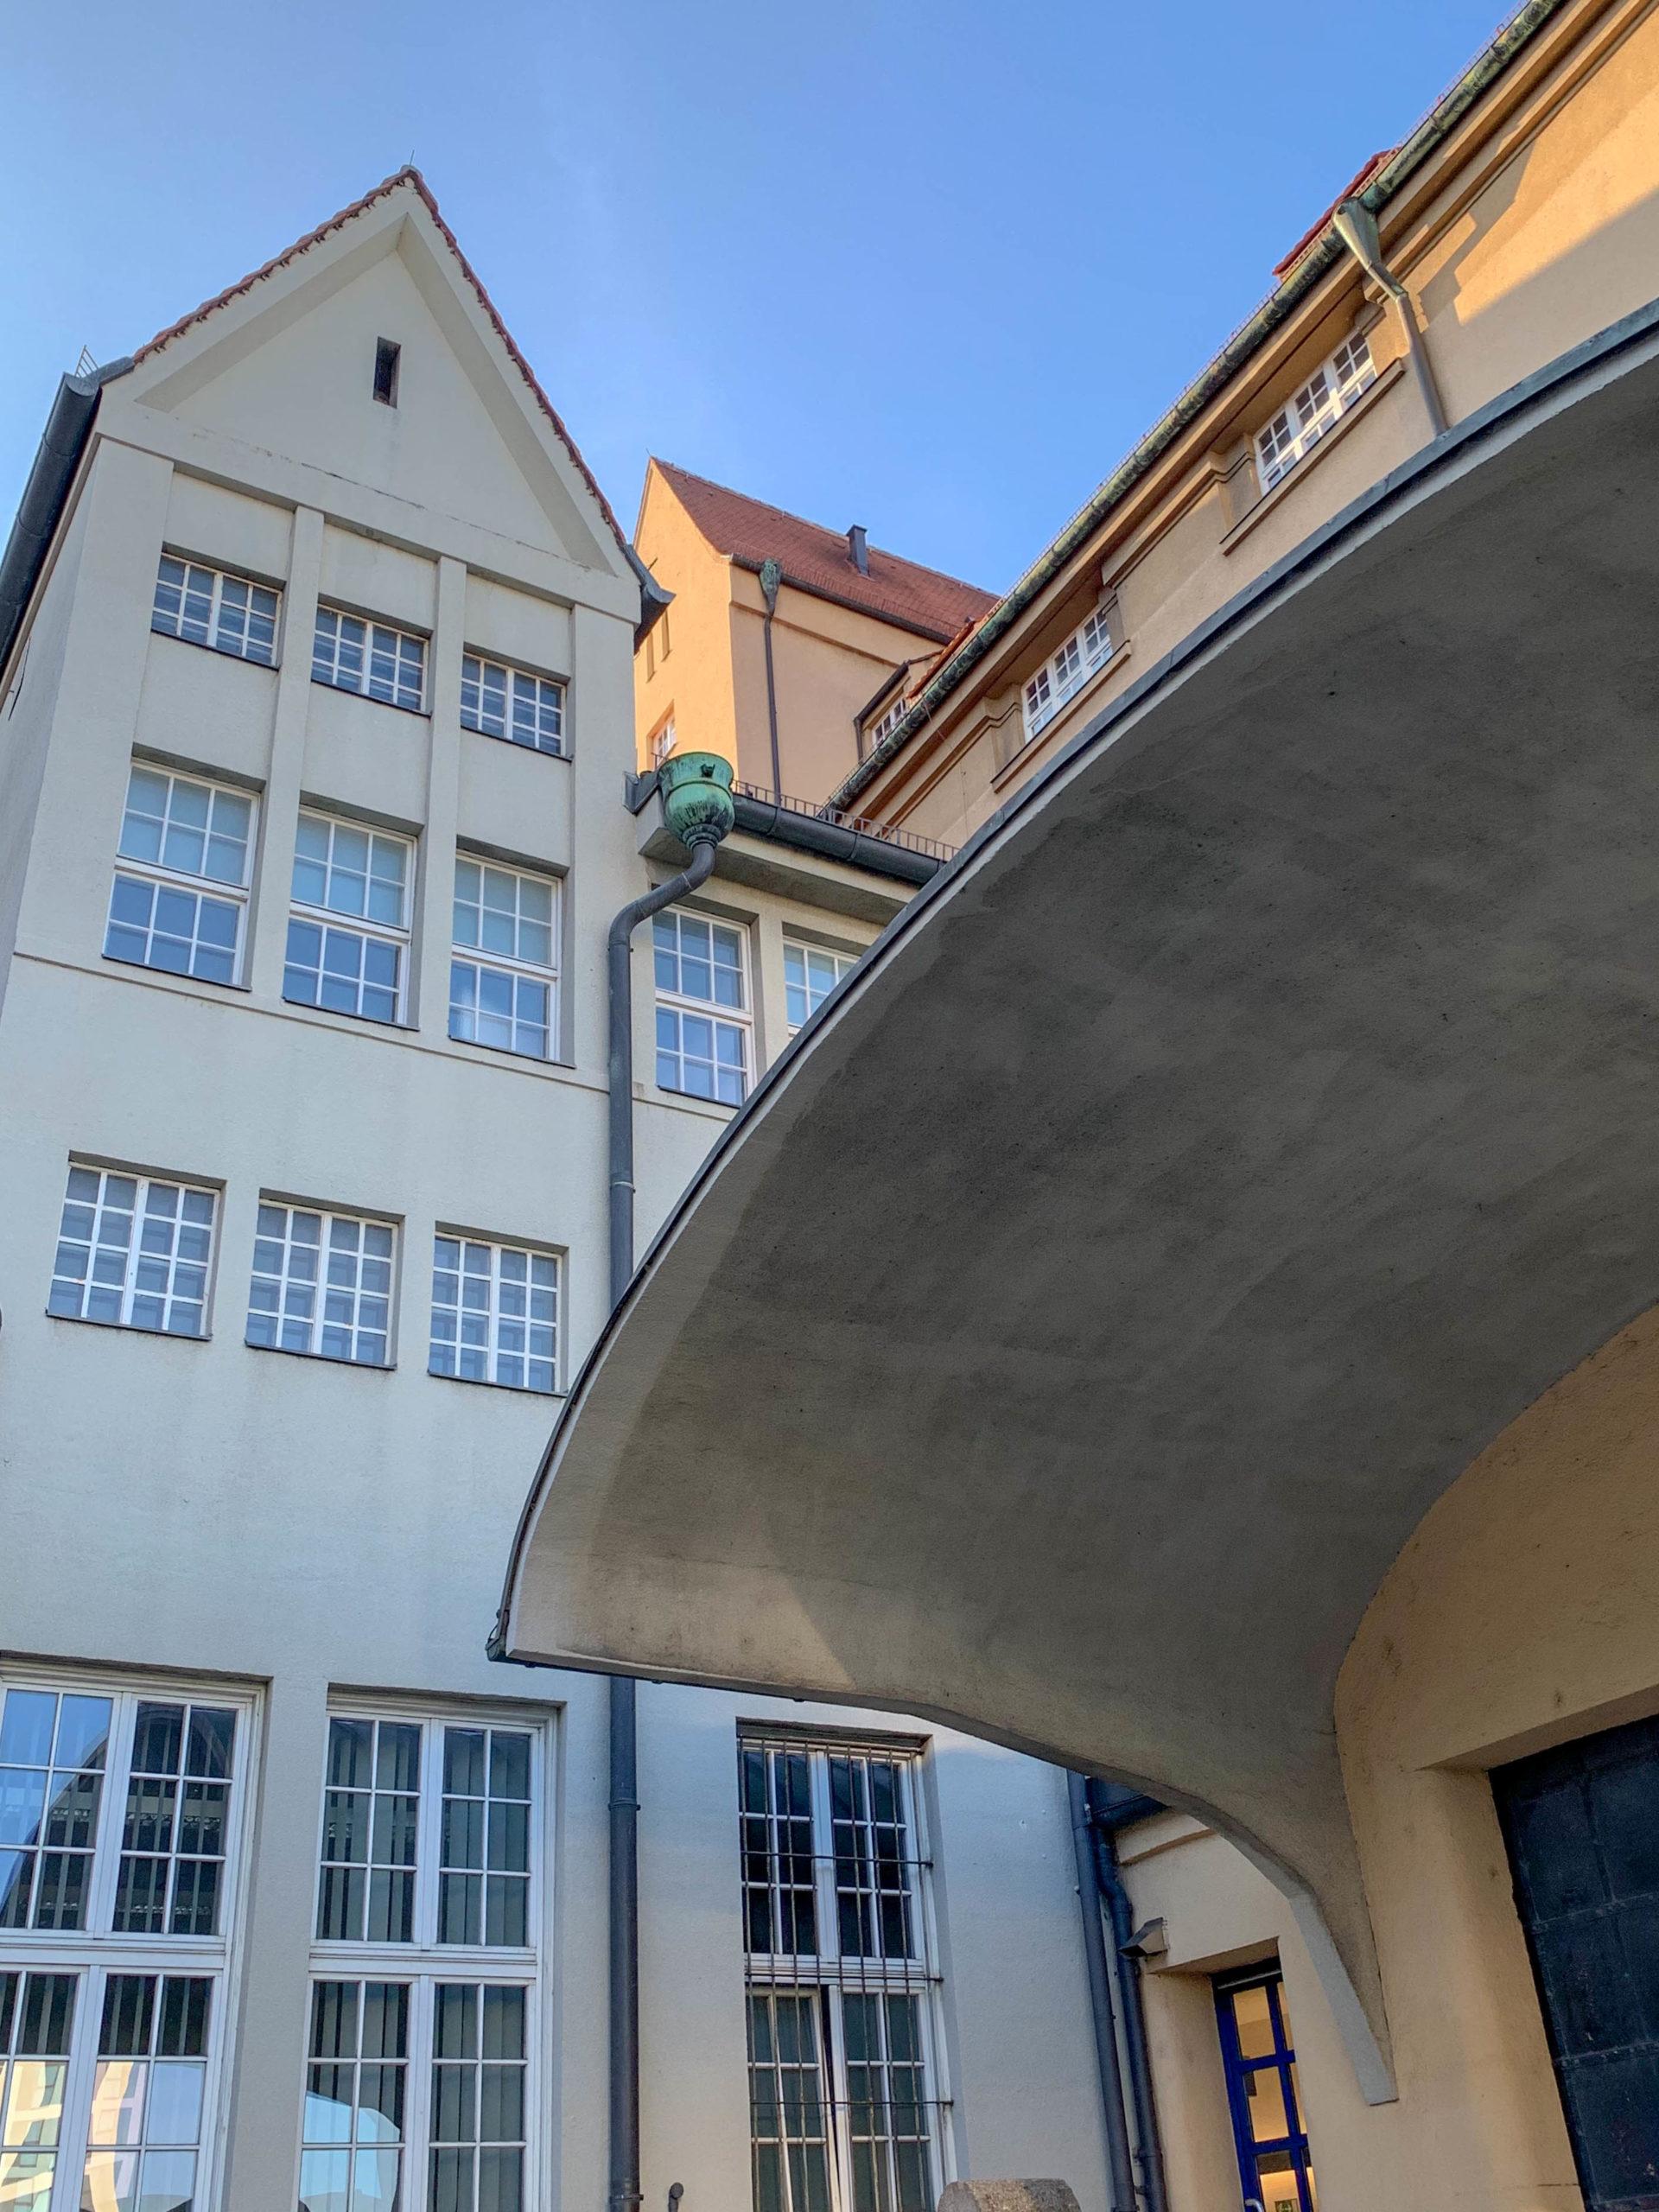 Main Customs Office, 1912. Architect: Hugo Kaiser